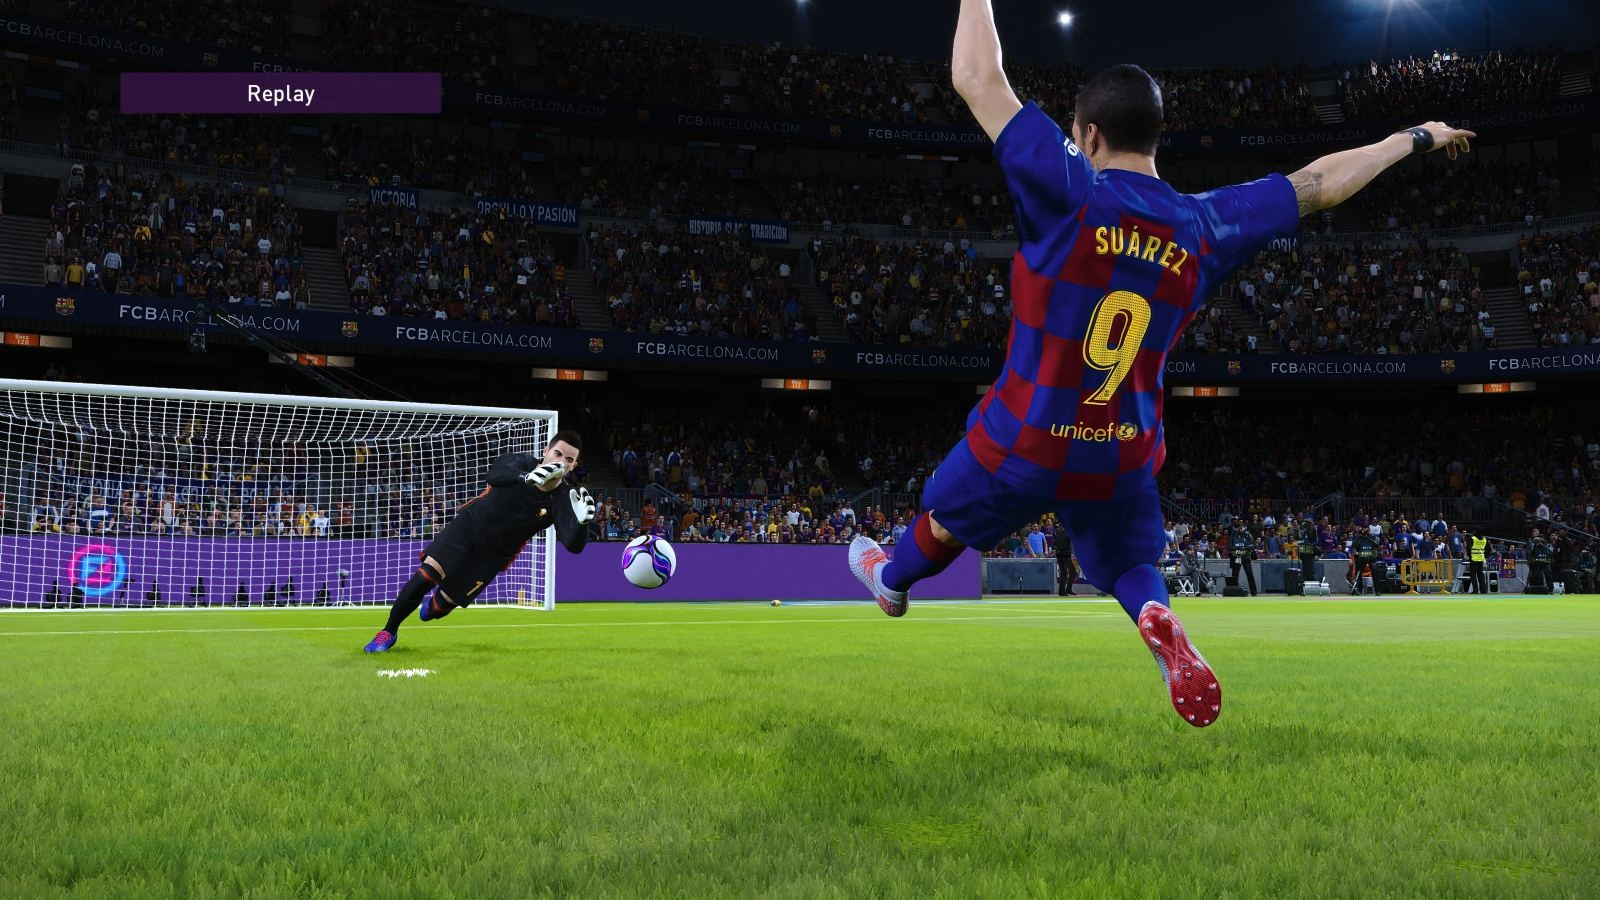 eFootball PES 2020; gameplay: Suaréz